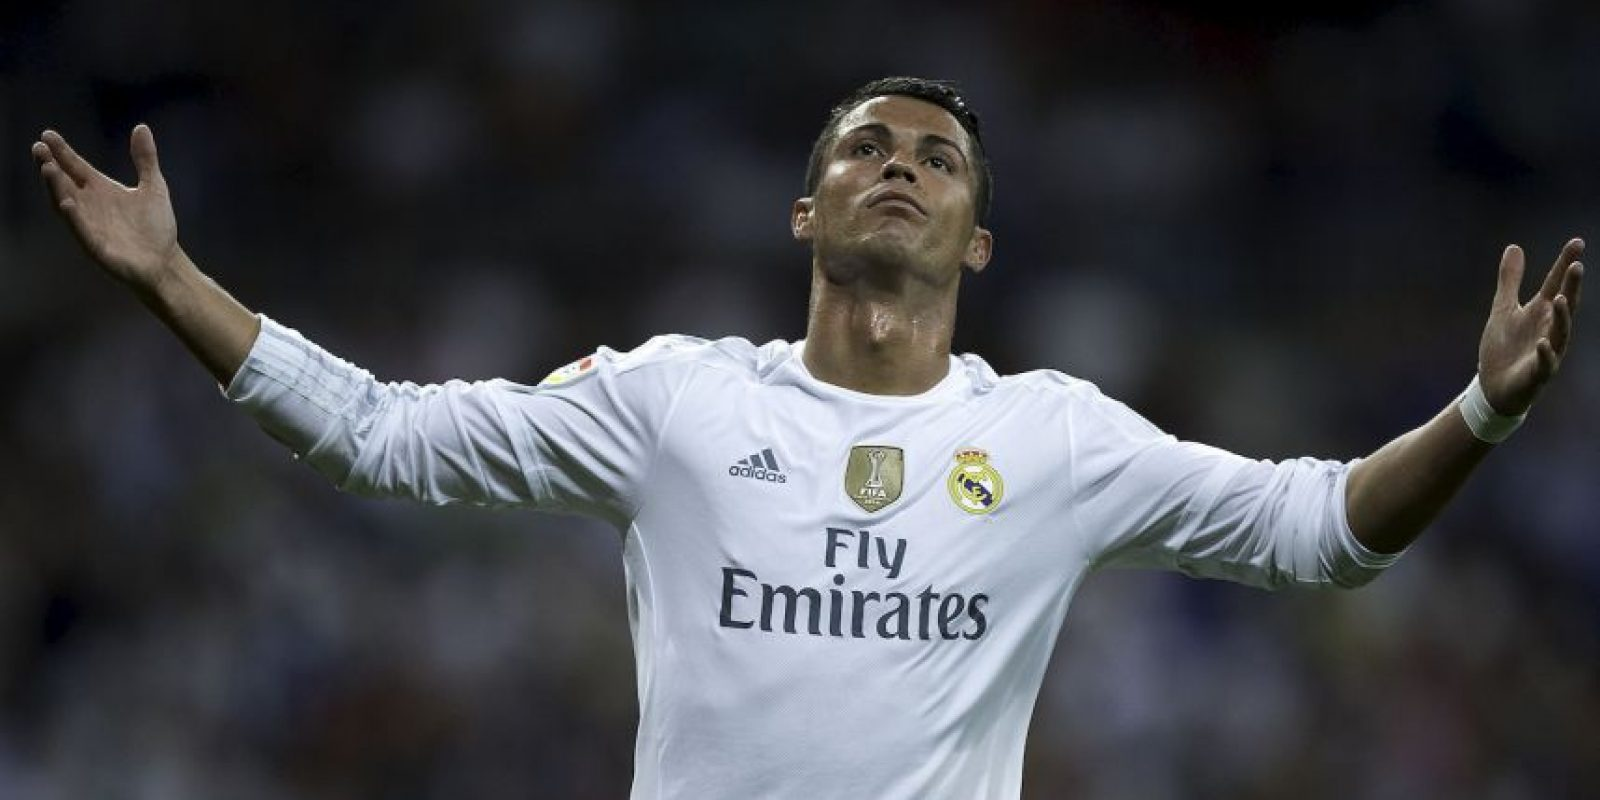 Cristiano Ronaldo, líder del Madrid, vale 120 millones de euros. Foto:Getty Images